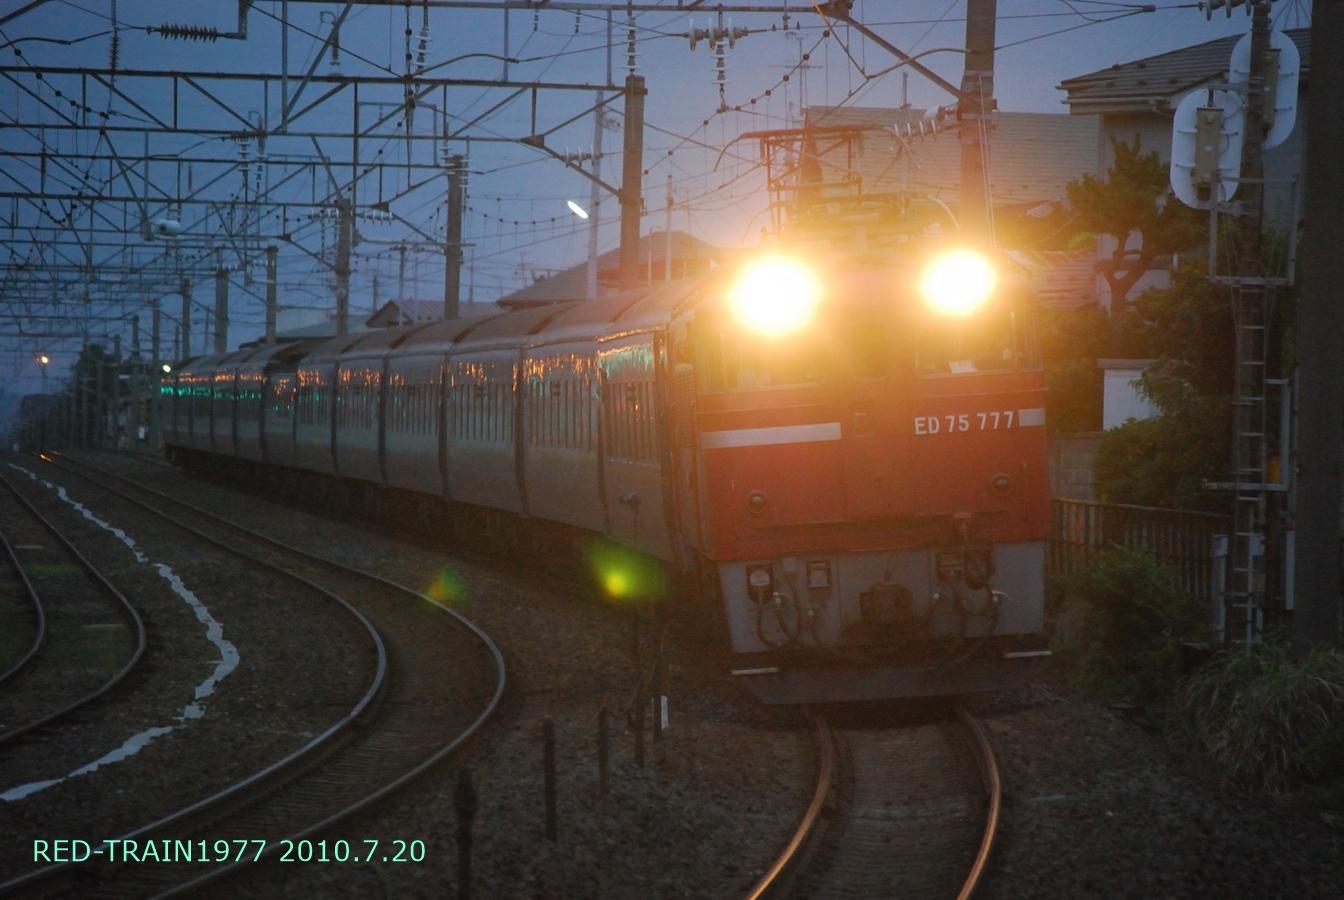 aDSC_0236.jpg